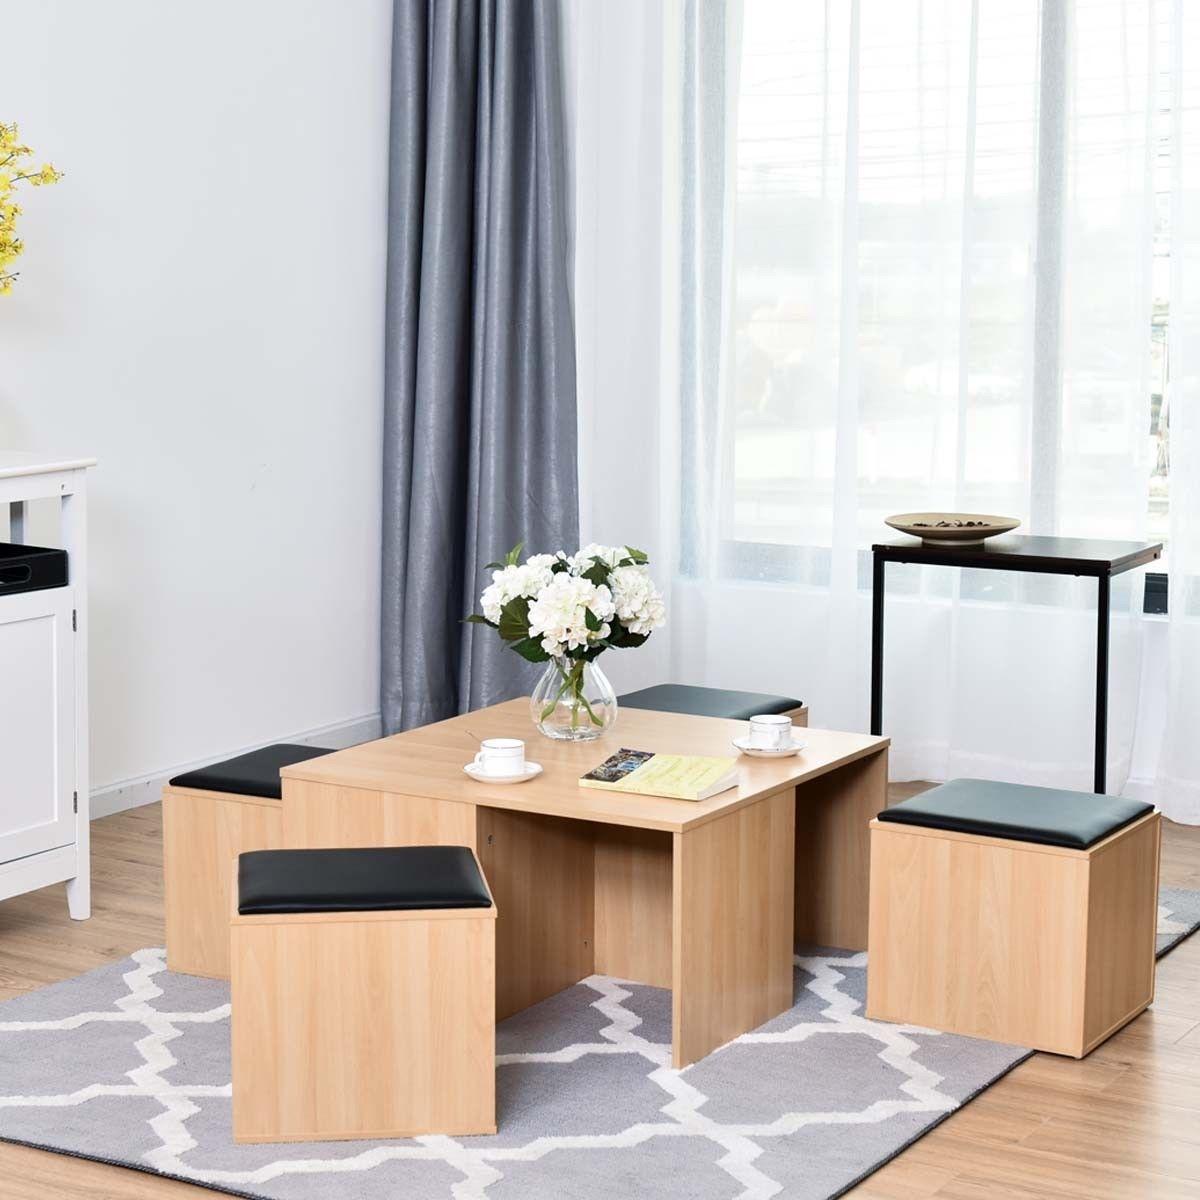 5 pcs Wood Living Room Table Set with 4 Storage Ottoman Stool